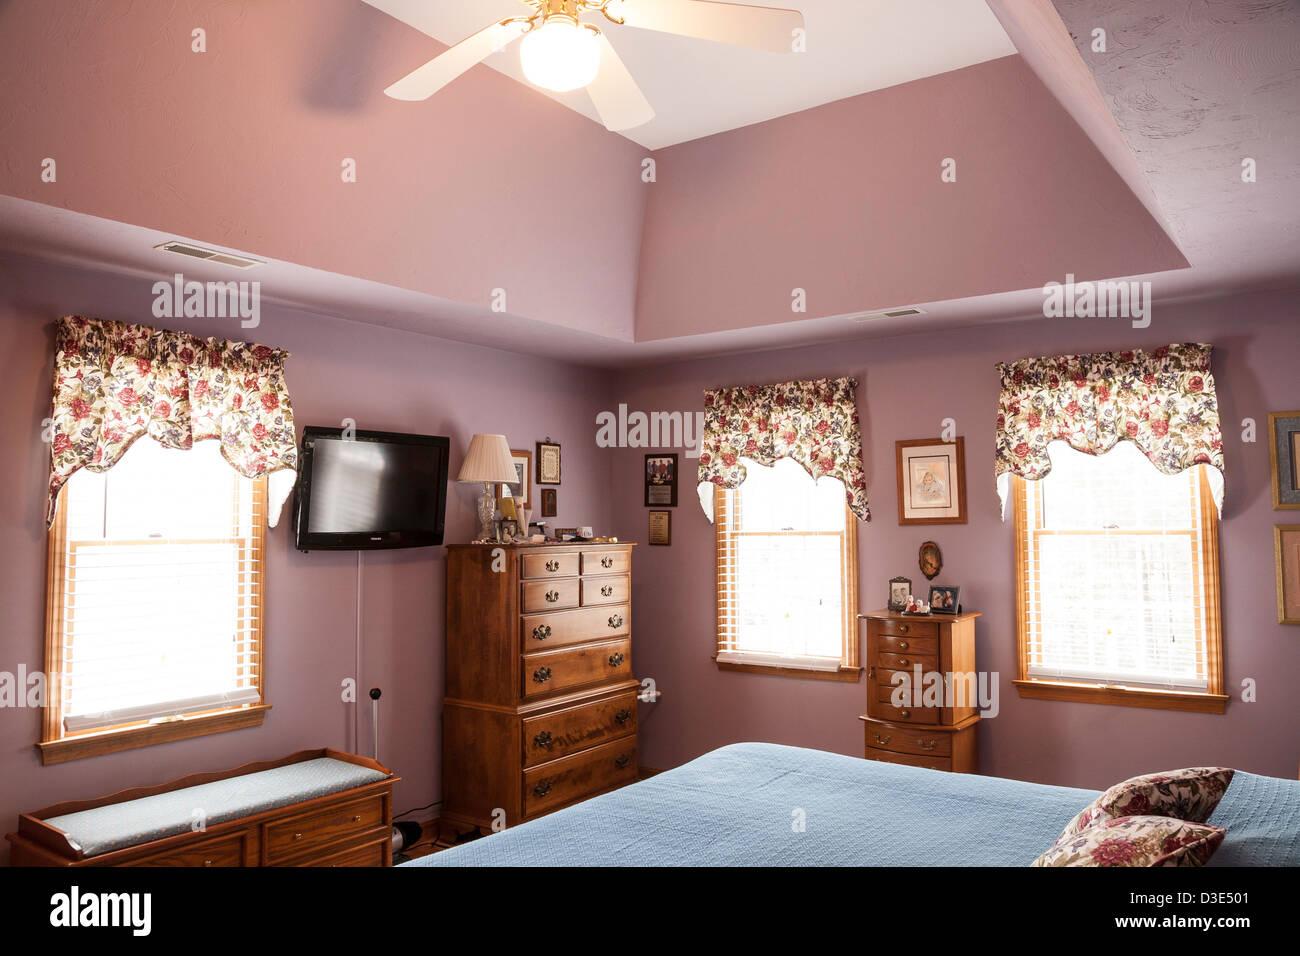 Showcase interior bedroom - Stock Image